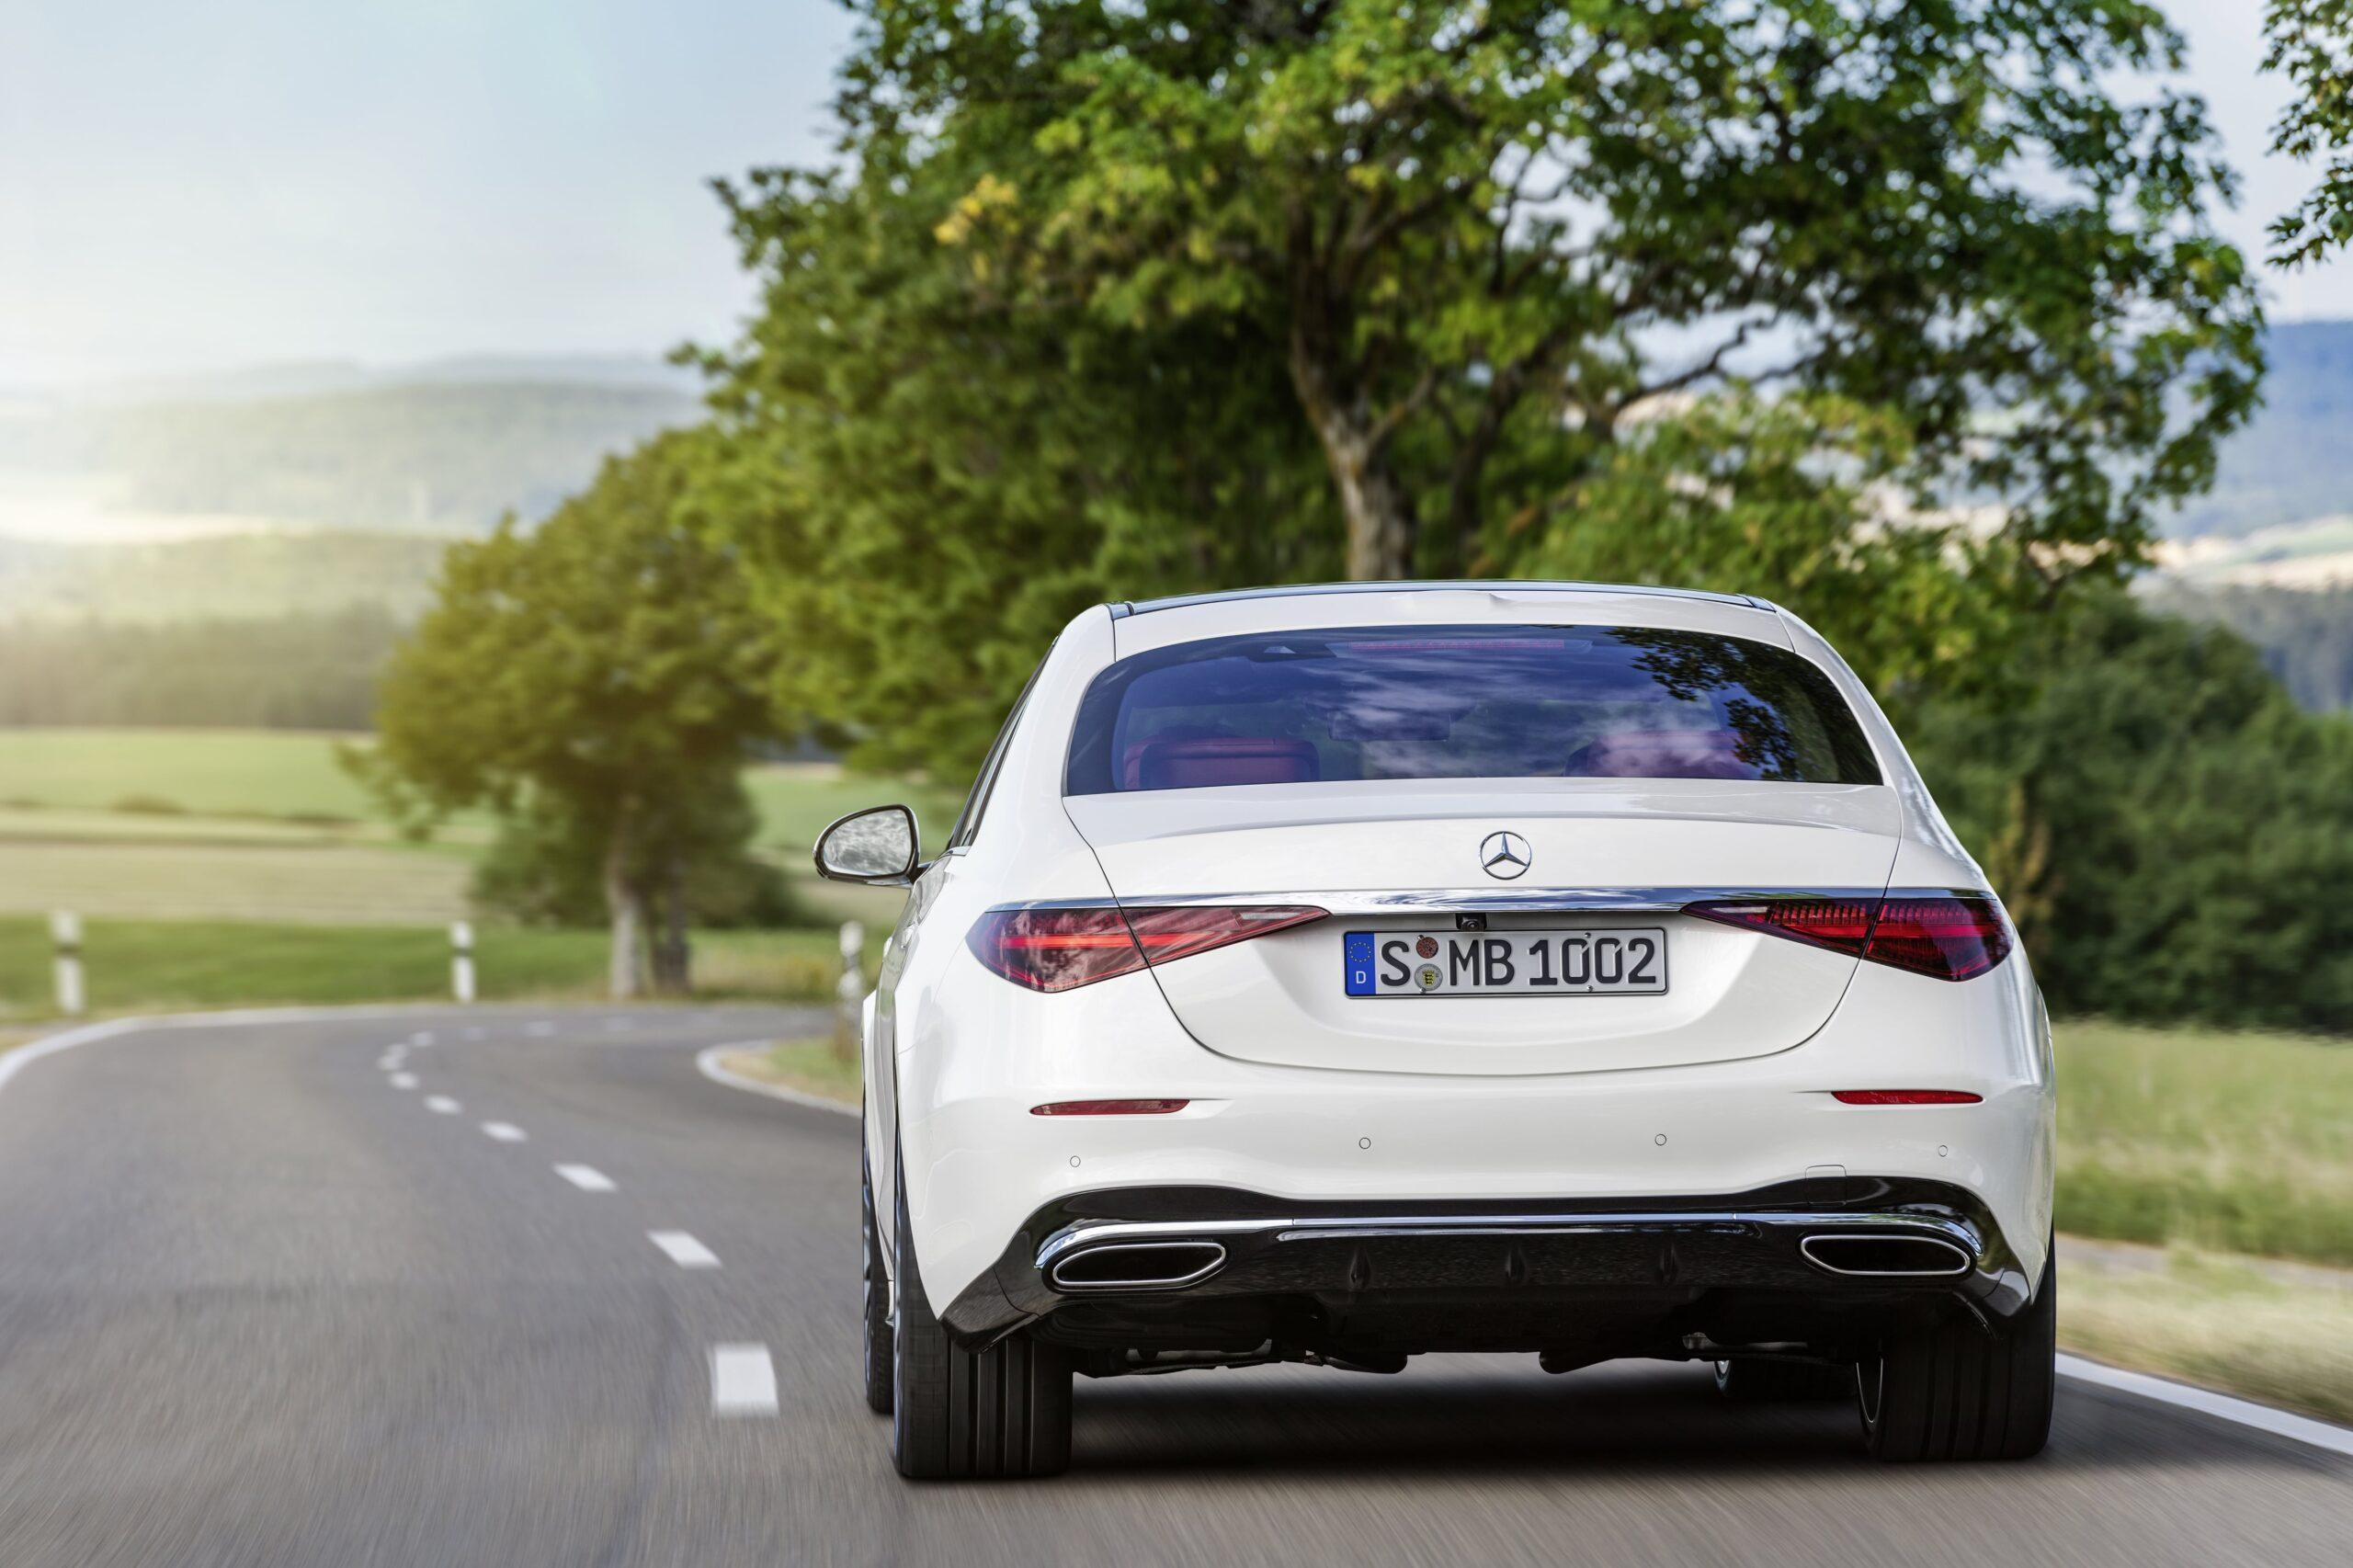 Mercedes Classe S Posteriore